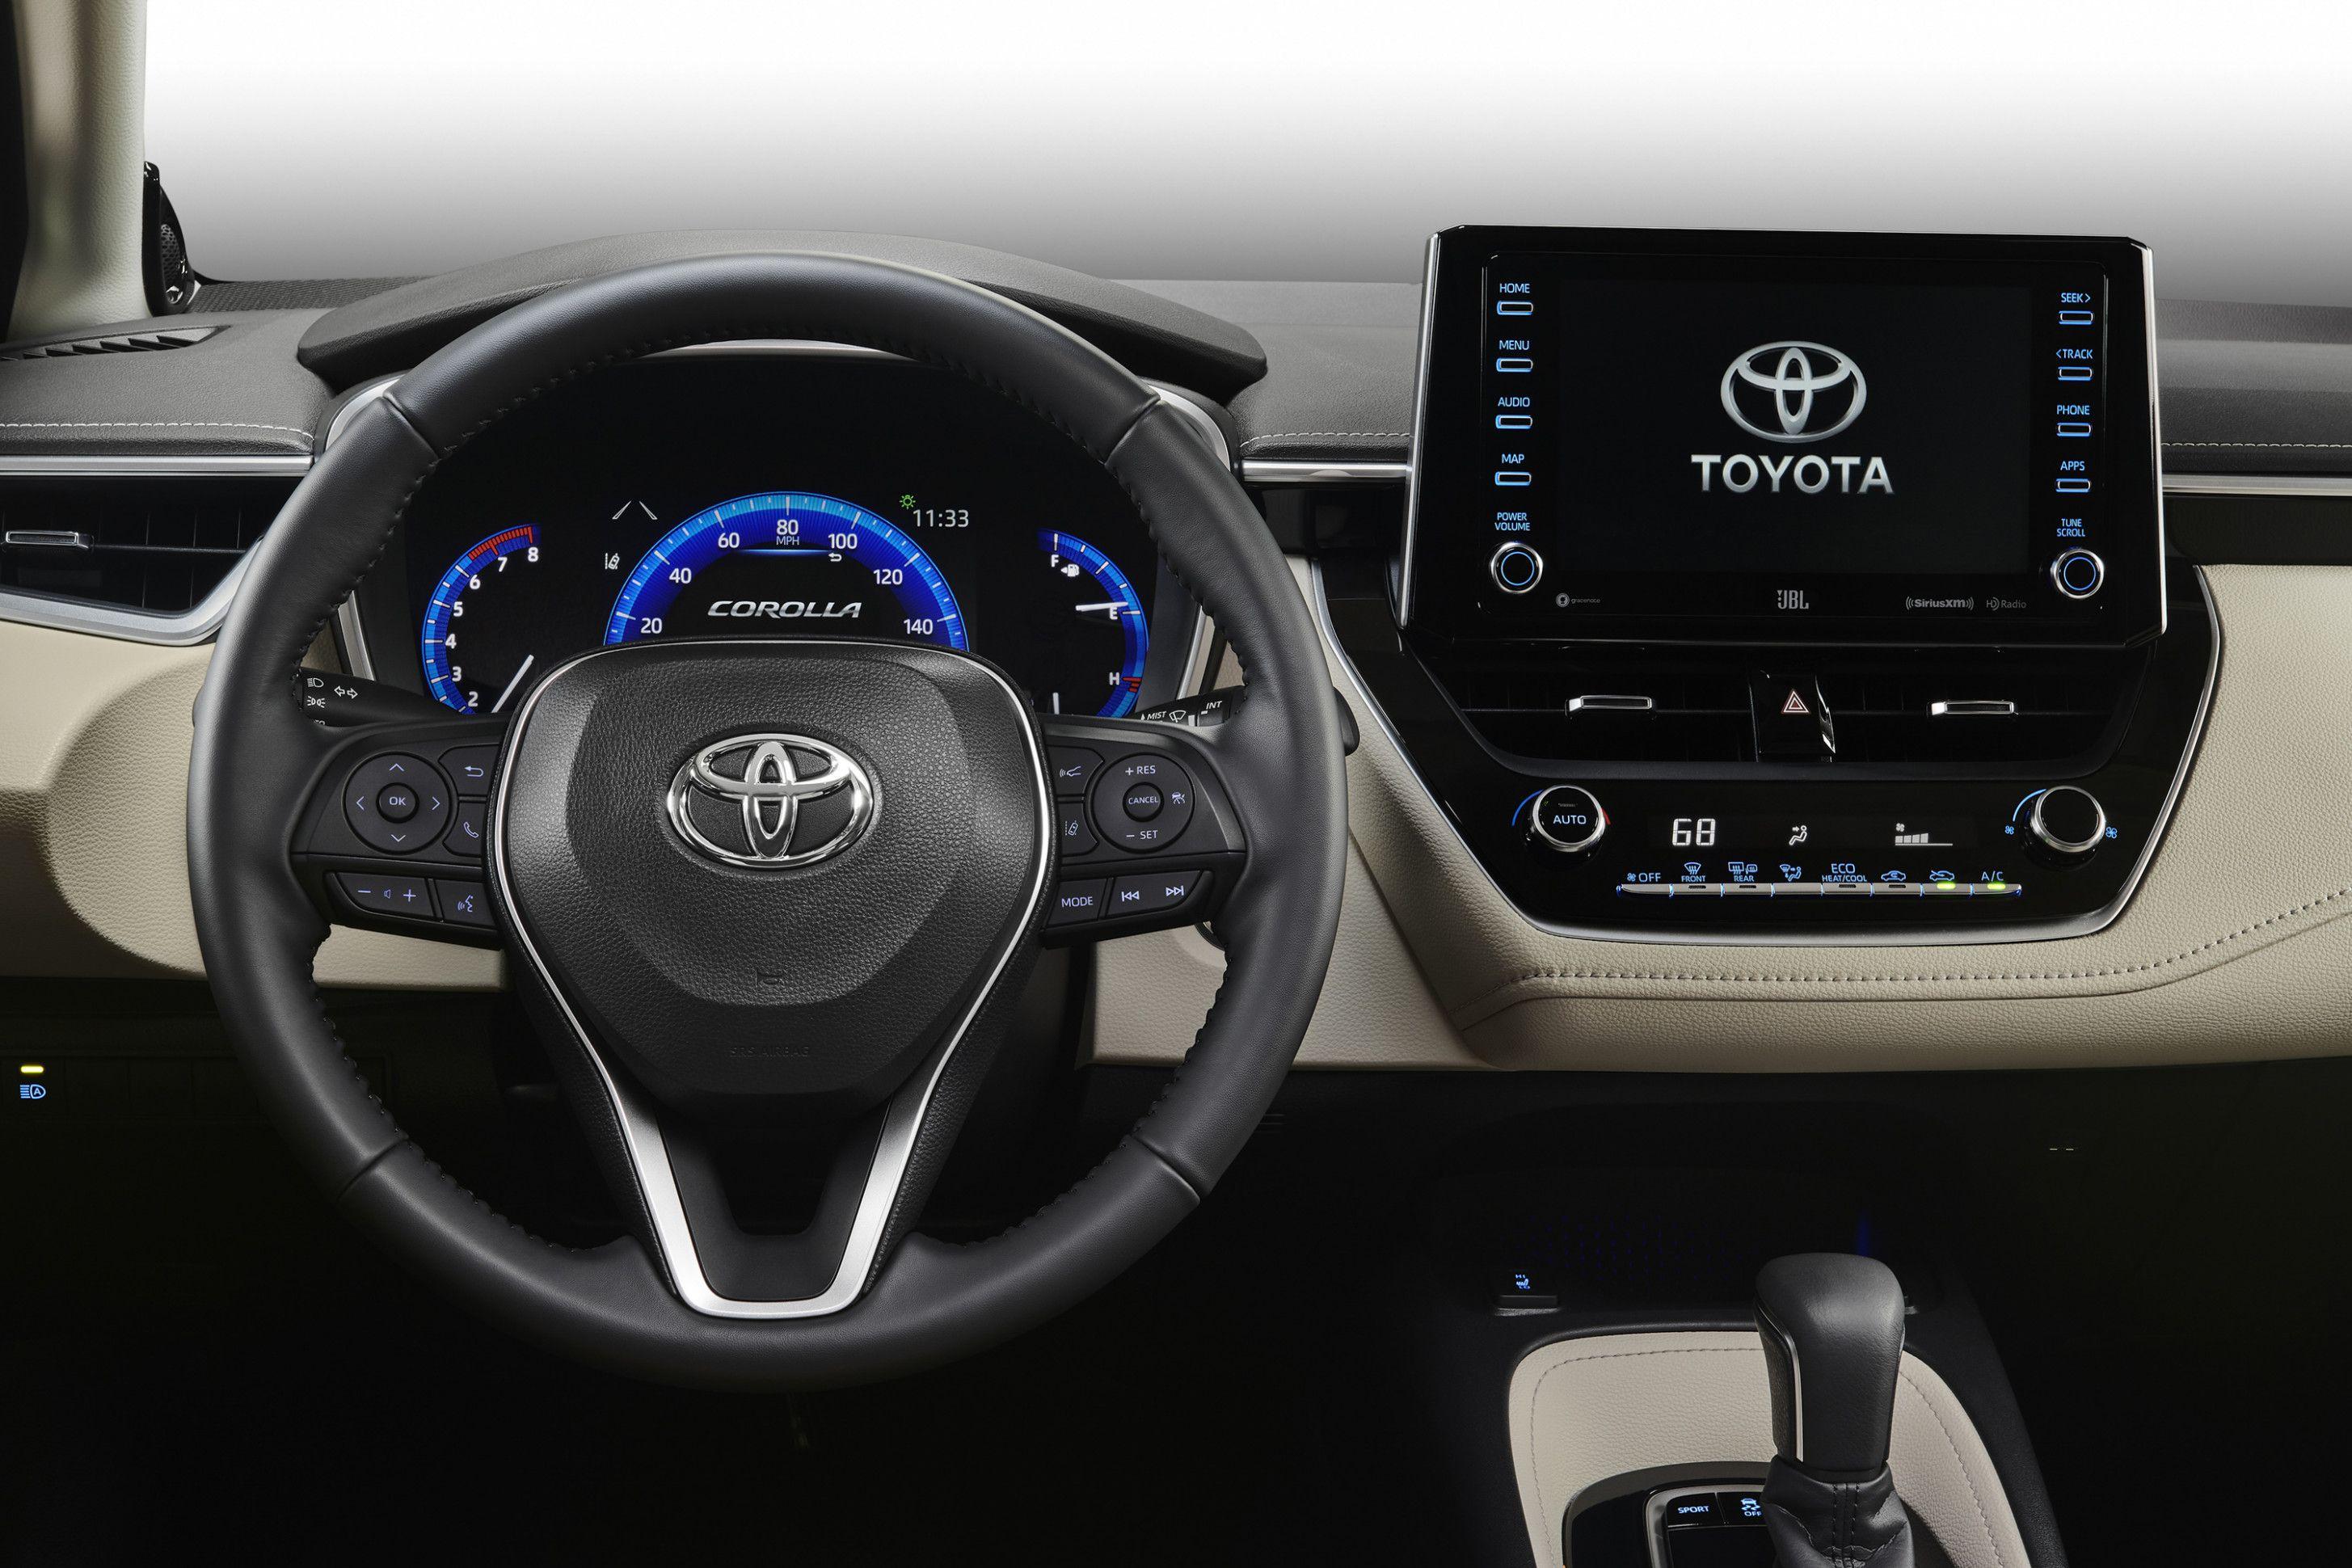 Toyota Corolla 2020 Price Wallpaper Toyota Corolla Toyota Porsche